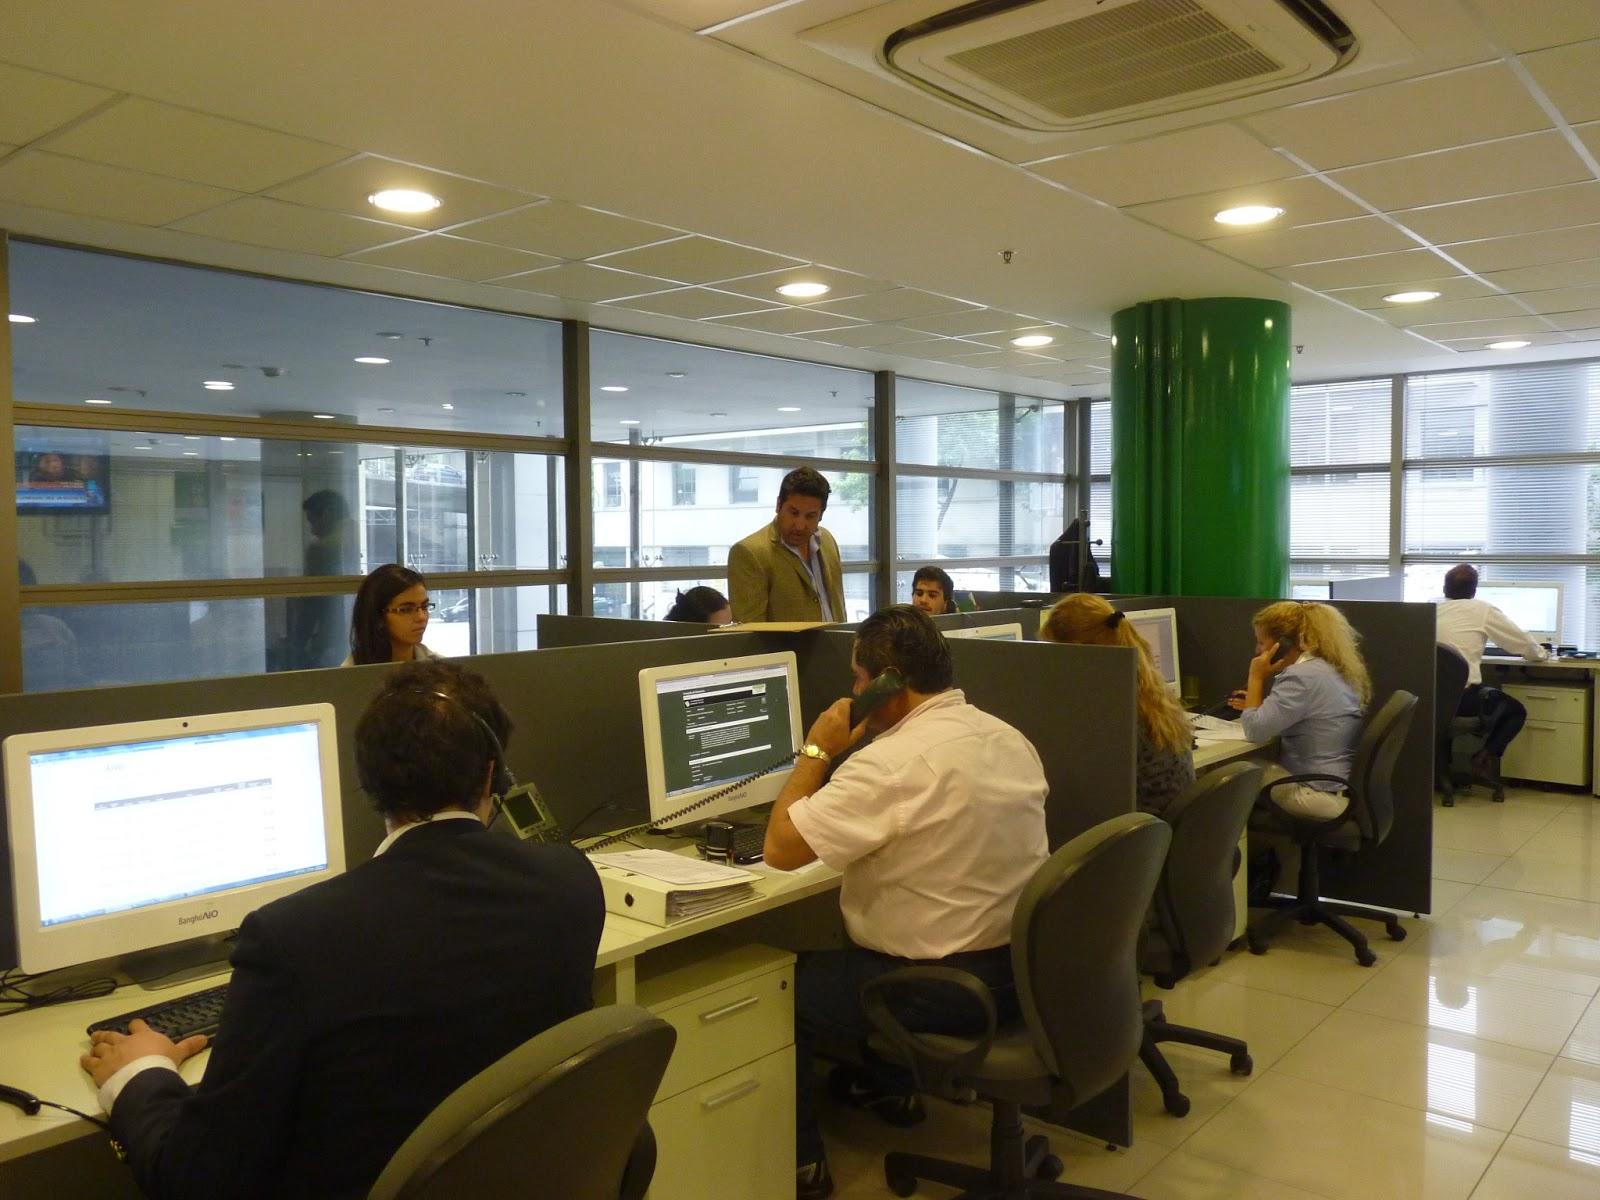 Oficina central receptora de denuncias capacitaci n for Oficina de denuncias